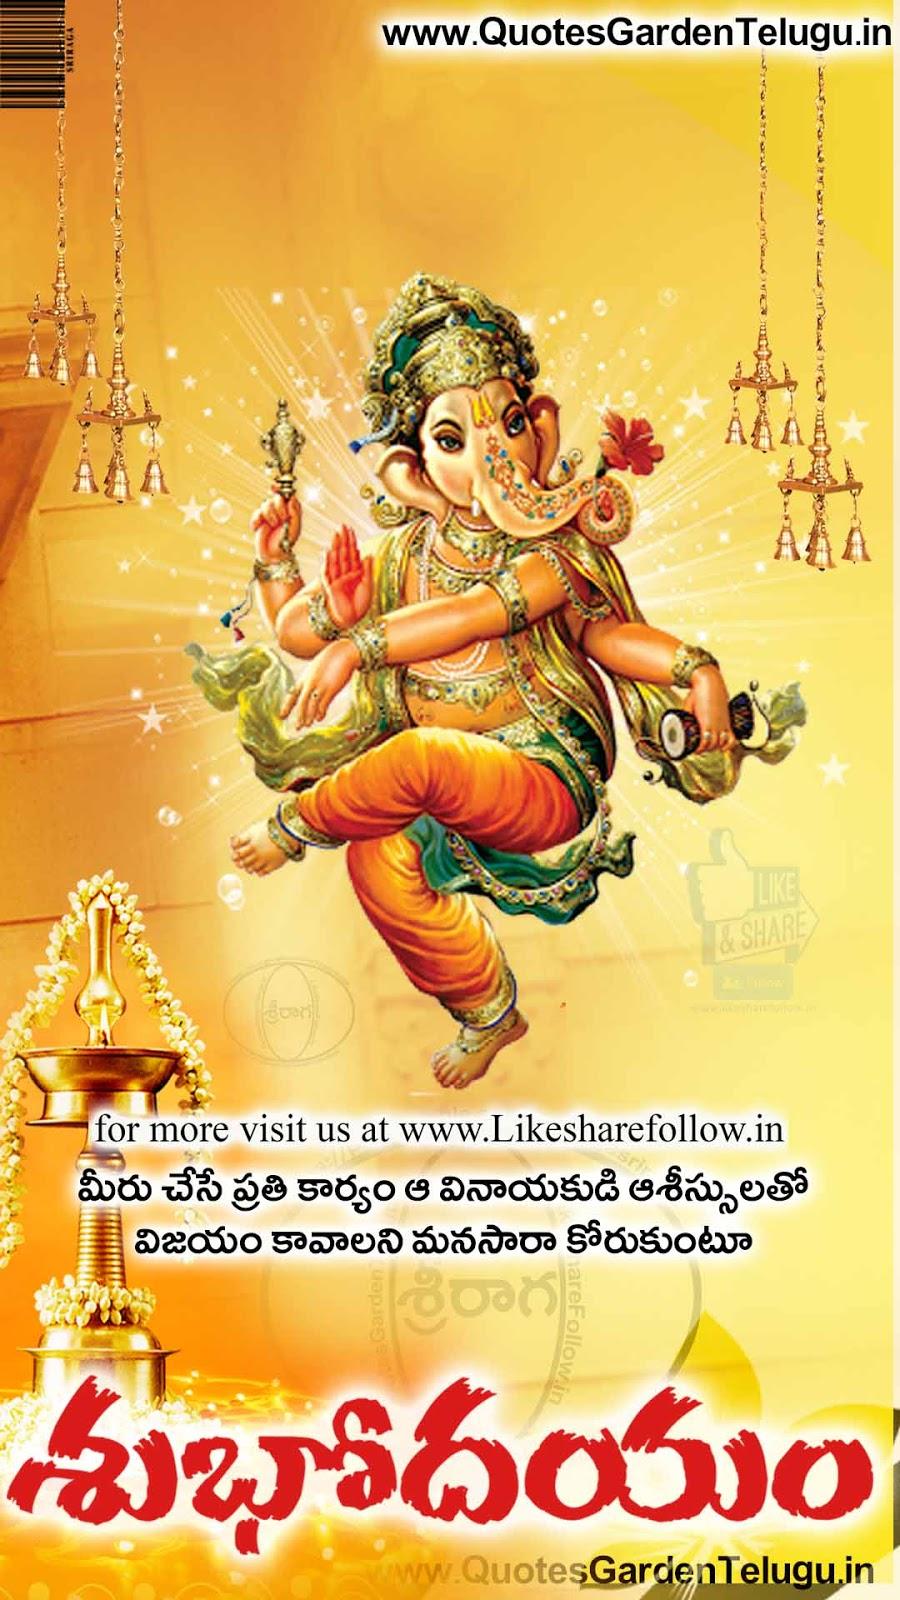 Best Wallpaper Lord Good Morning - Telugu%2BGood%2Bmorning%2BHD%2BMObile%2Bwallpapers%2Bwith%2BLord%2BGanesha  Pic_961356.jpg